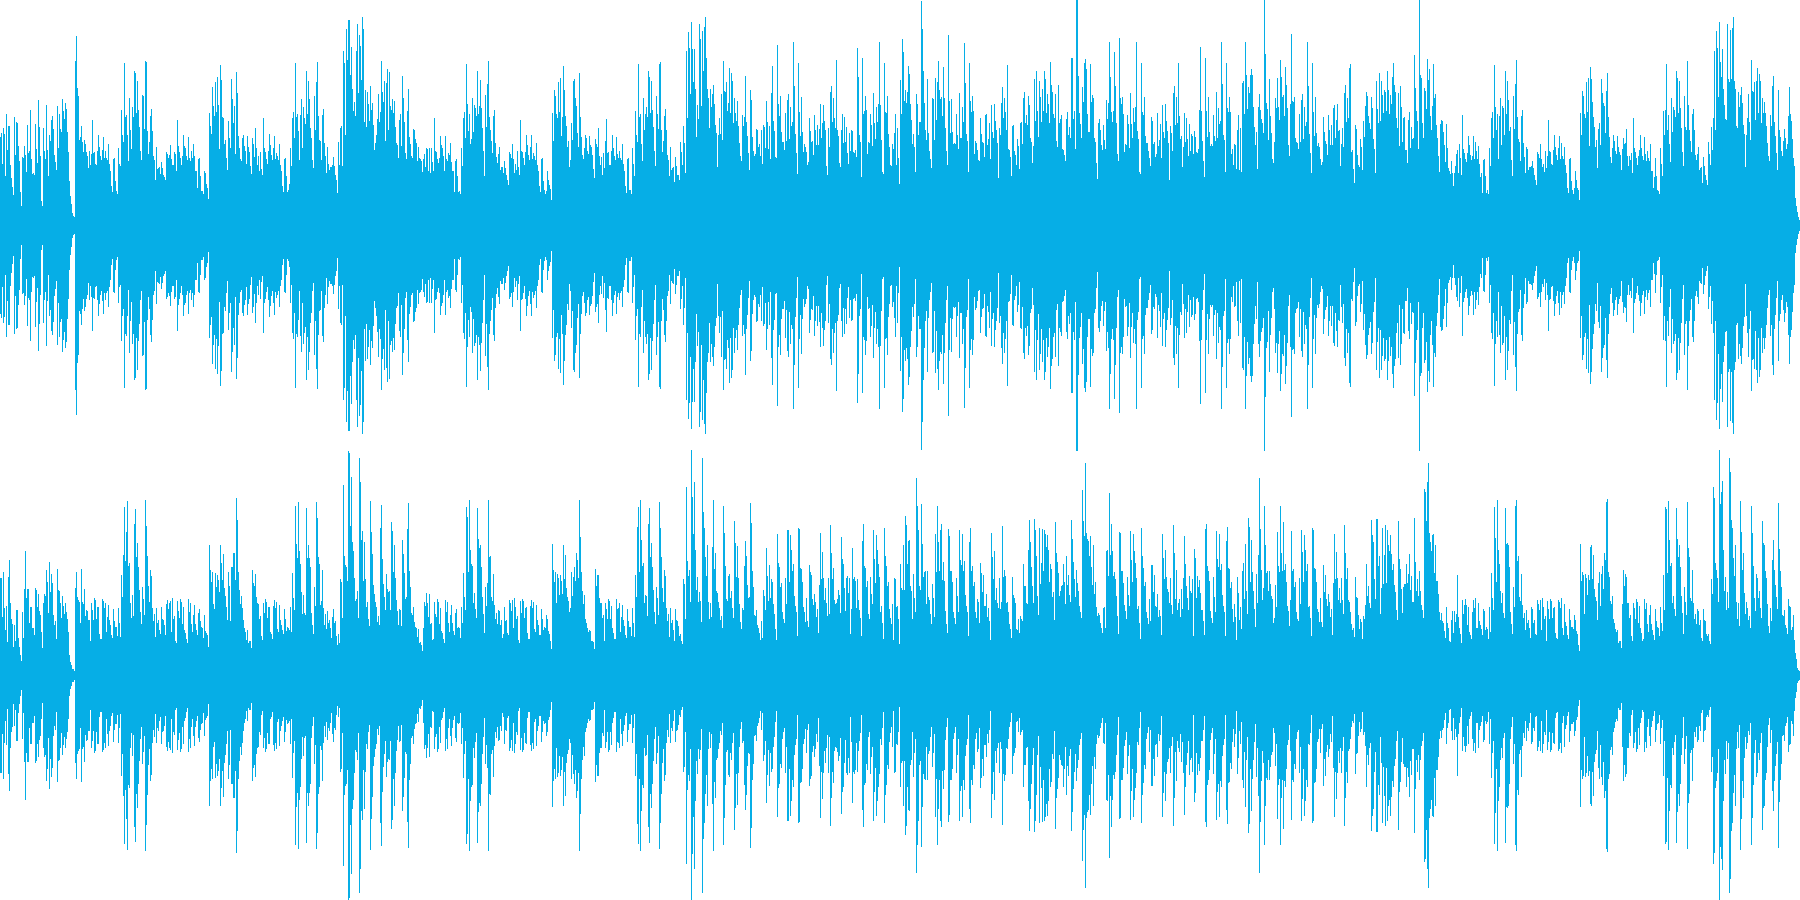 The Entertainerカバーの再生済みの波形